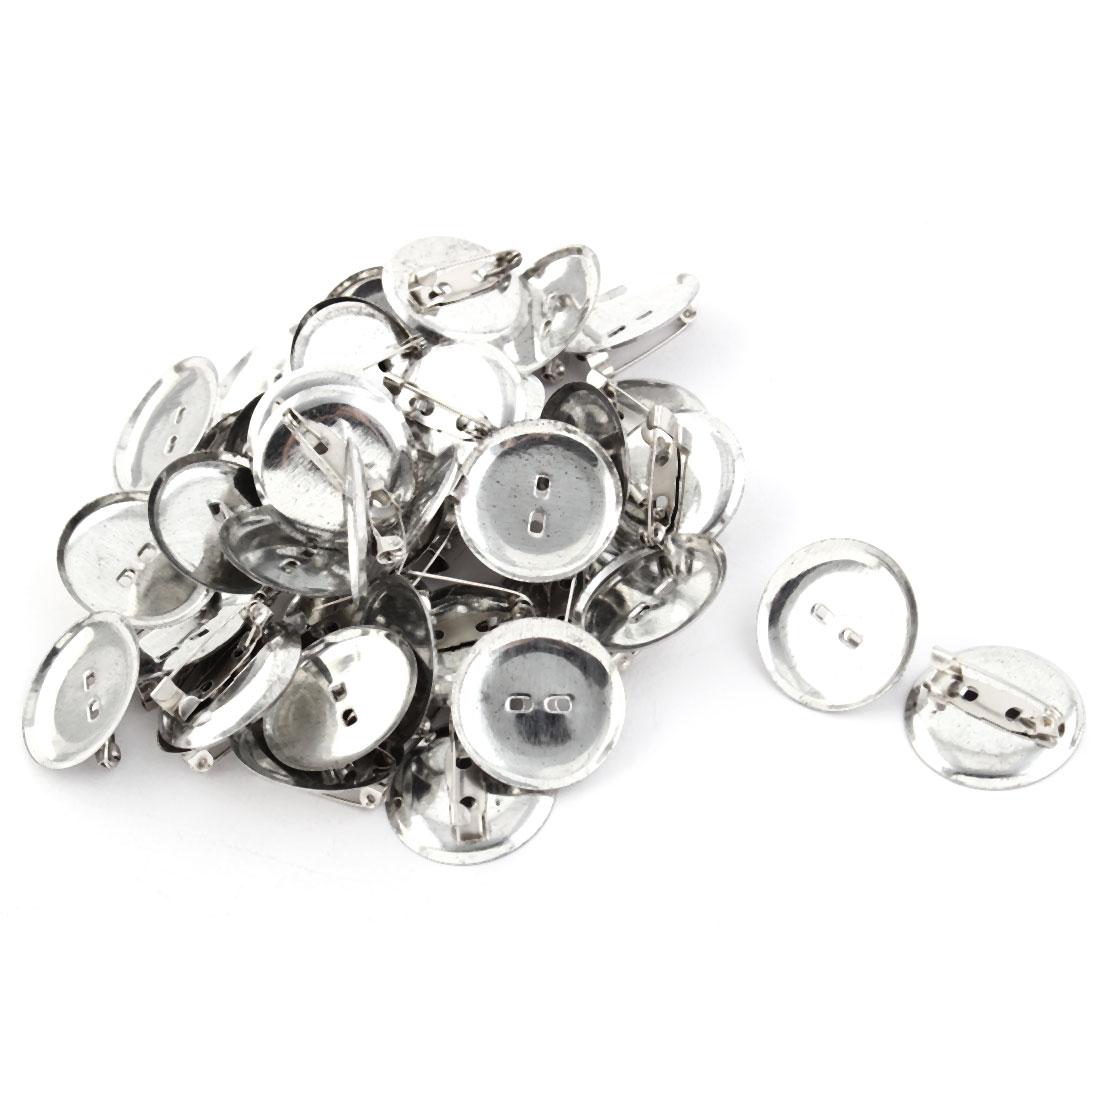 Women Round Safety Pin Back Brooch Finding DIY Base Silver Tone 2.4cm Dia 40pcs - image 1 de 1